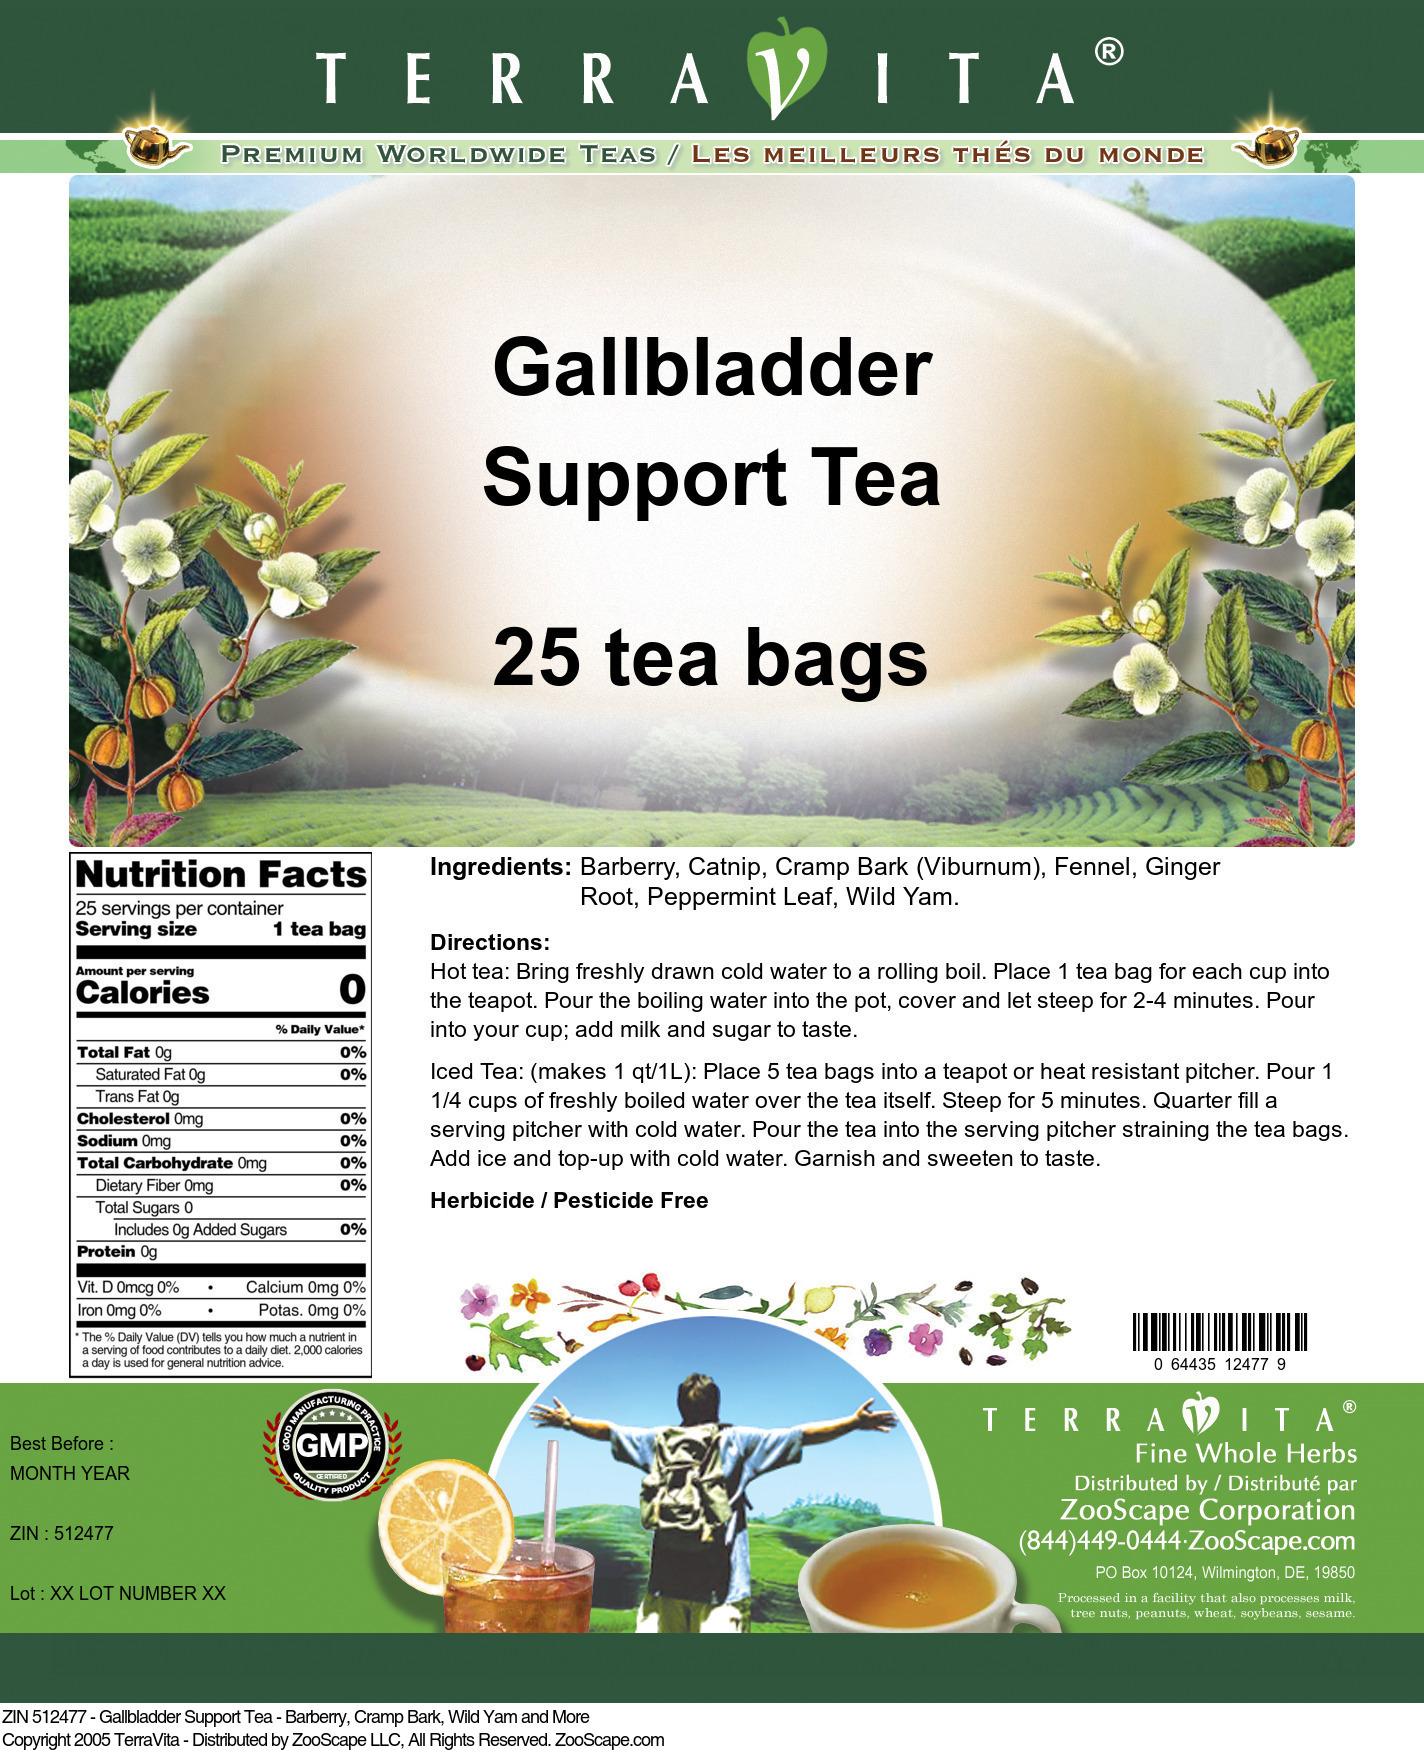 Gallbladder Support Tea - Barberry, Cramp Bark, Wild Yam and More